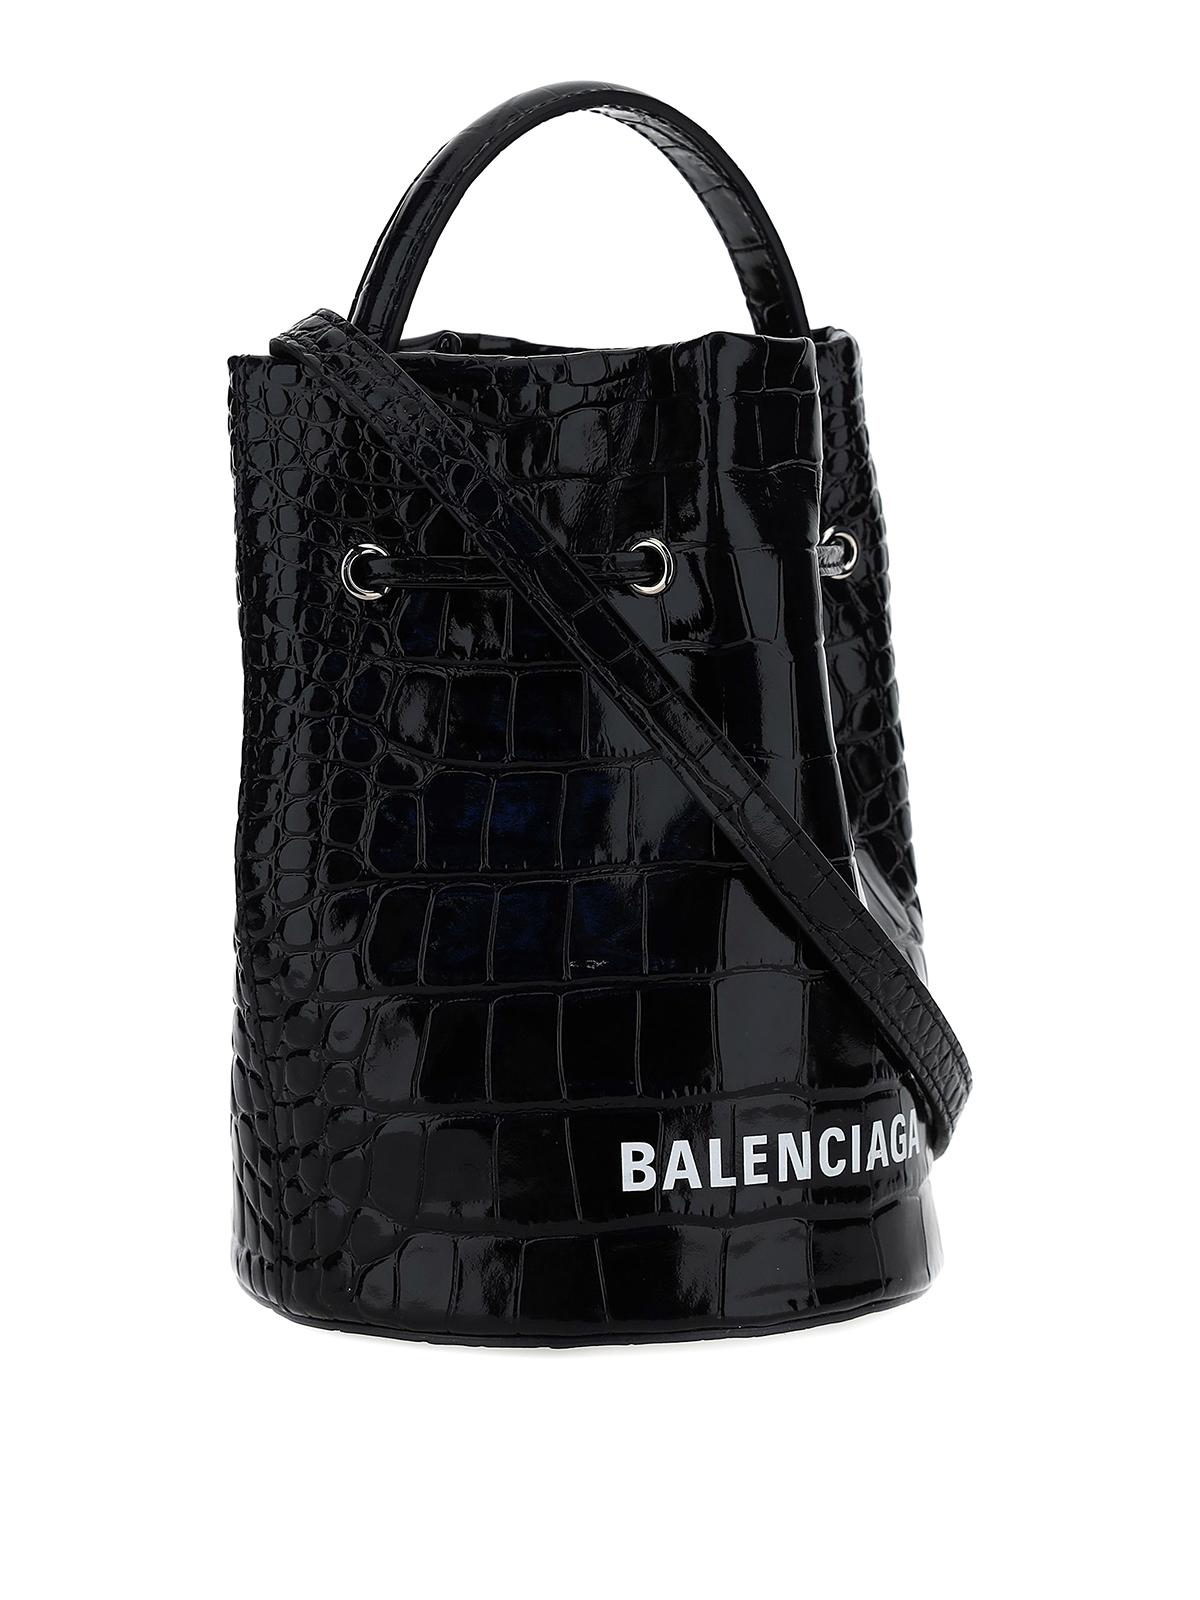 Balenciaga Everyday Xs Bucket Bag کیف خمره ای 6383421romn1000